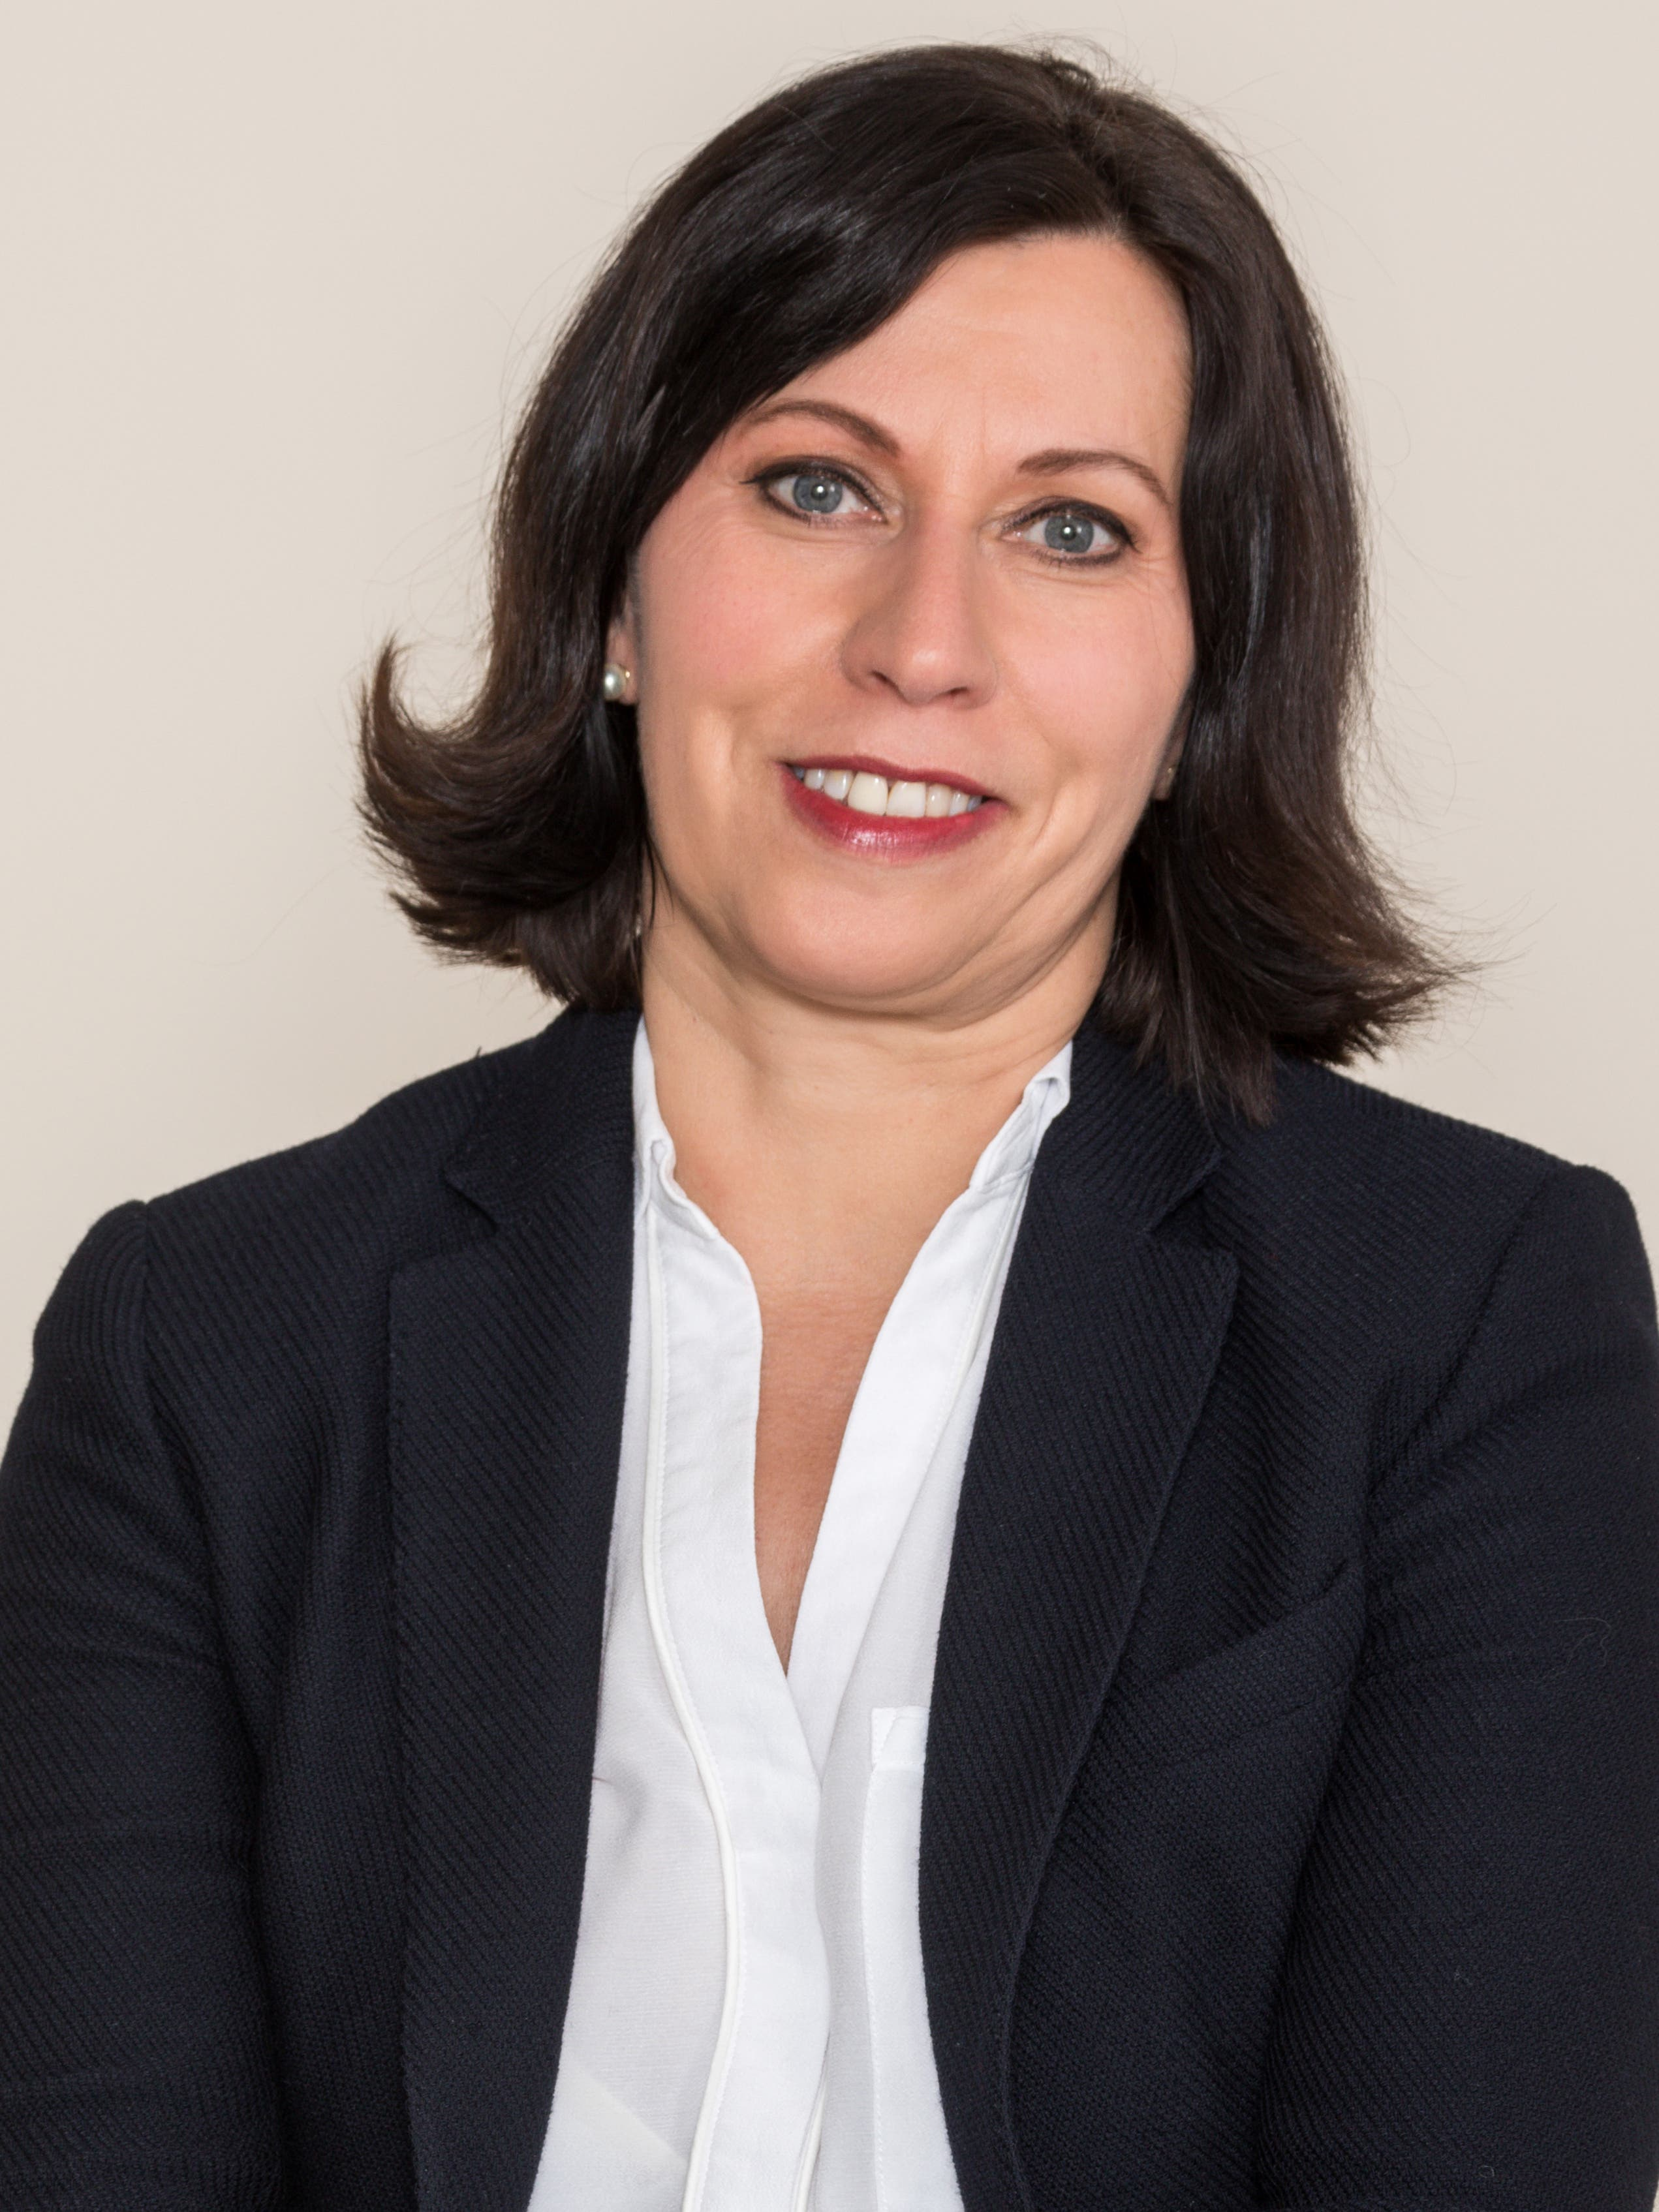 Gewählt: Ester Zogg-Elmiger, FDP